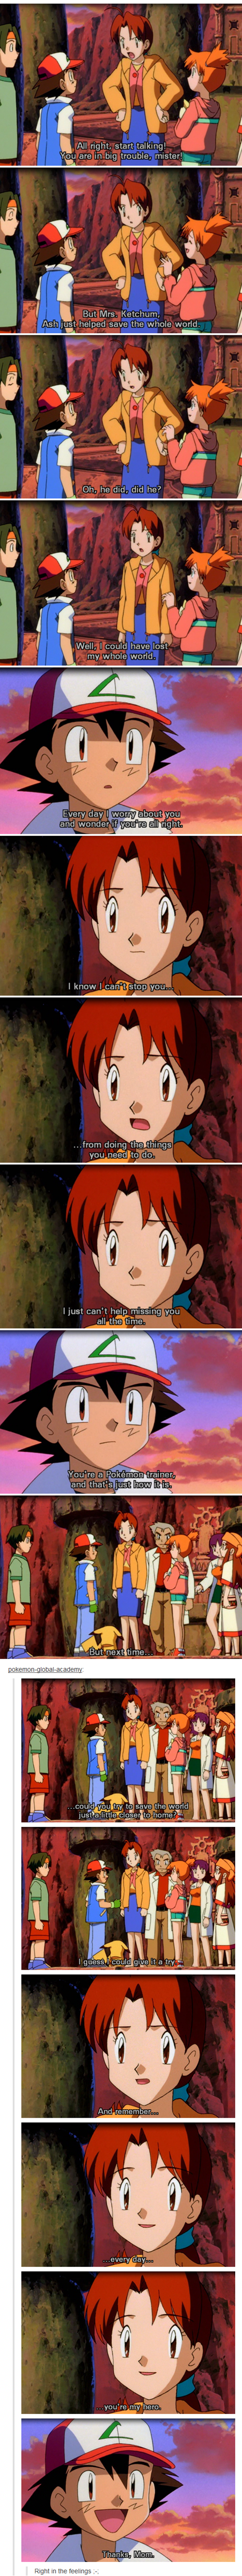 ash ketchum Pokémon anime - 8433587200